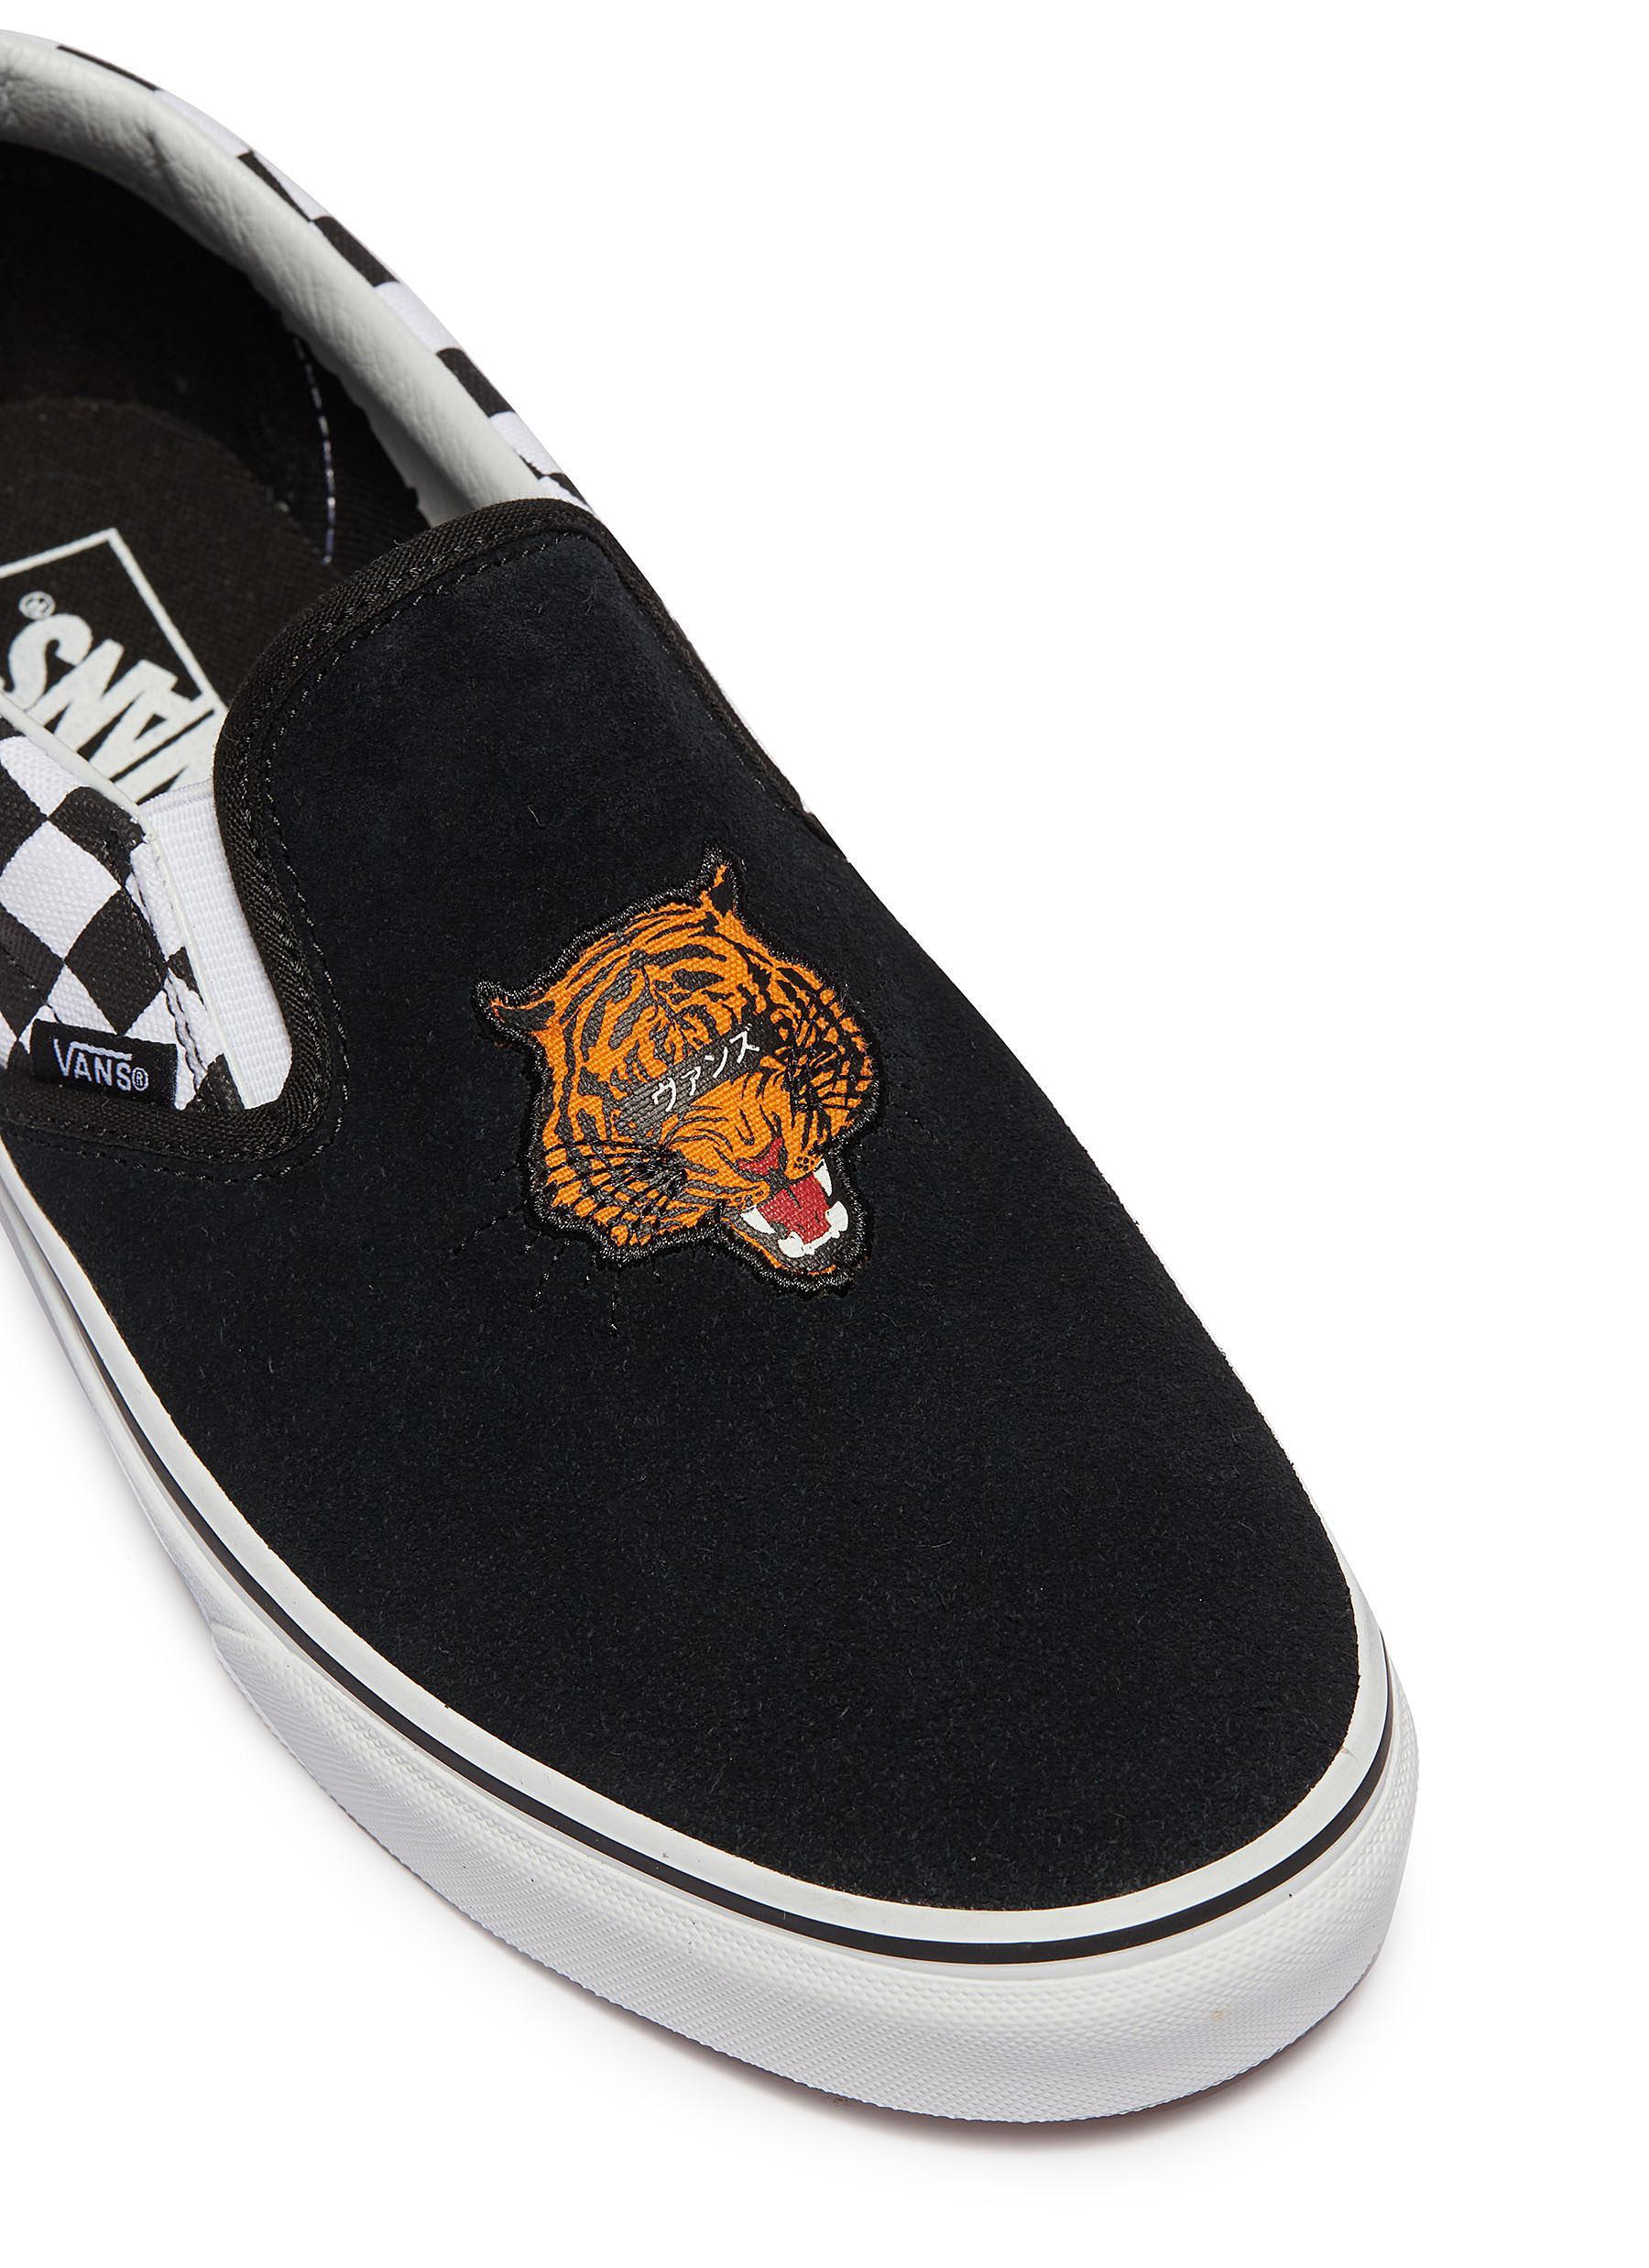 Vans Suede Ua Classic Slip On Tiger